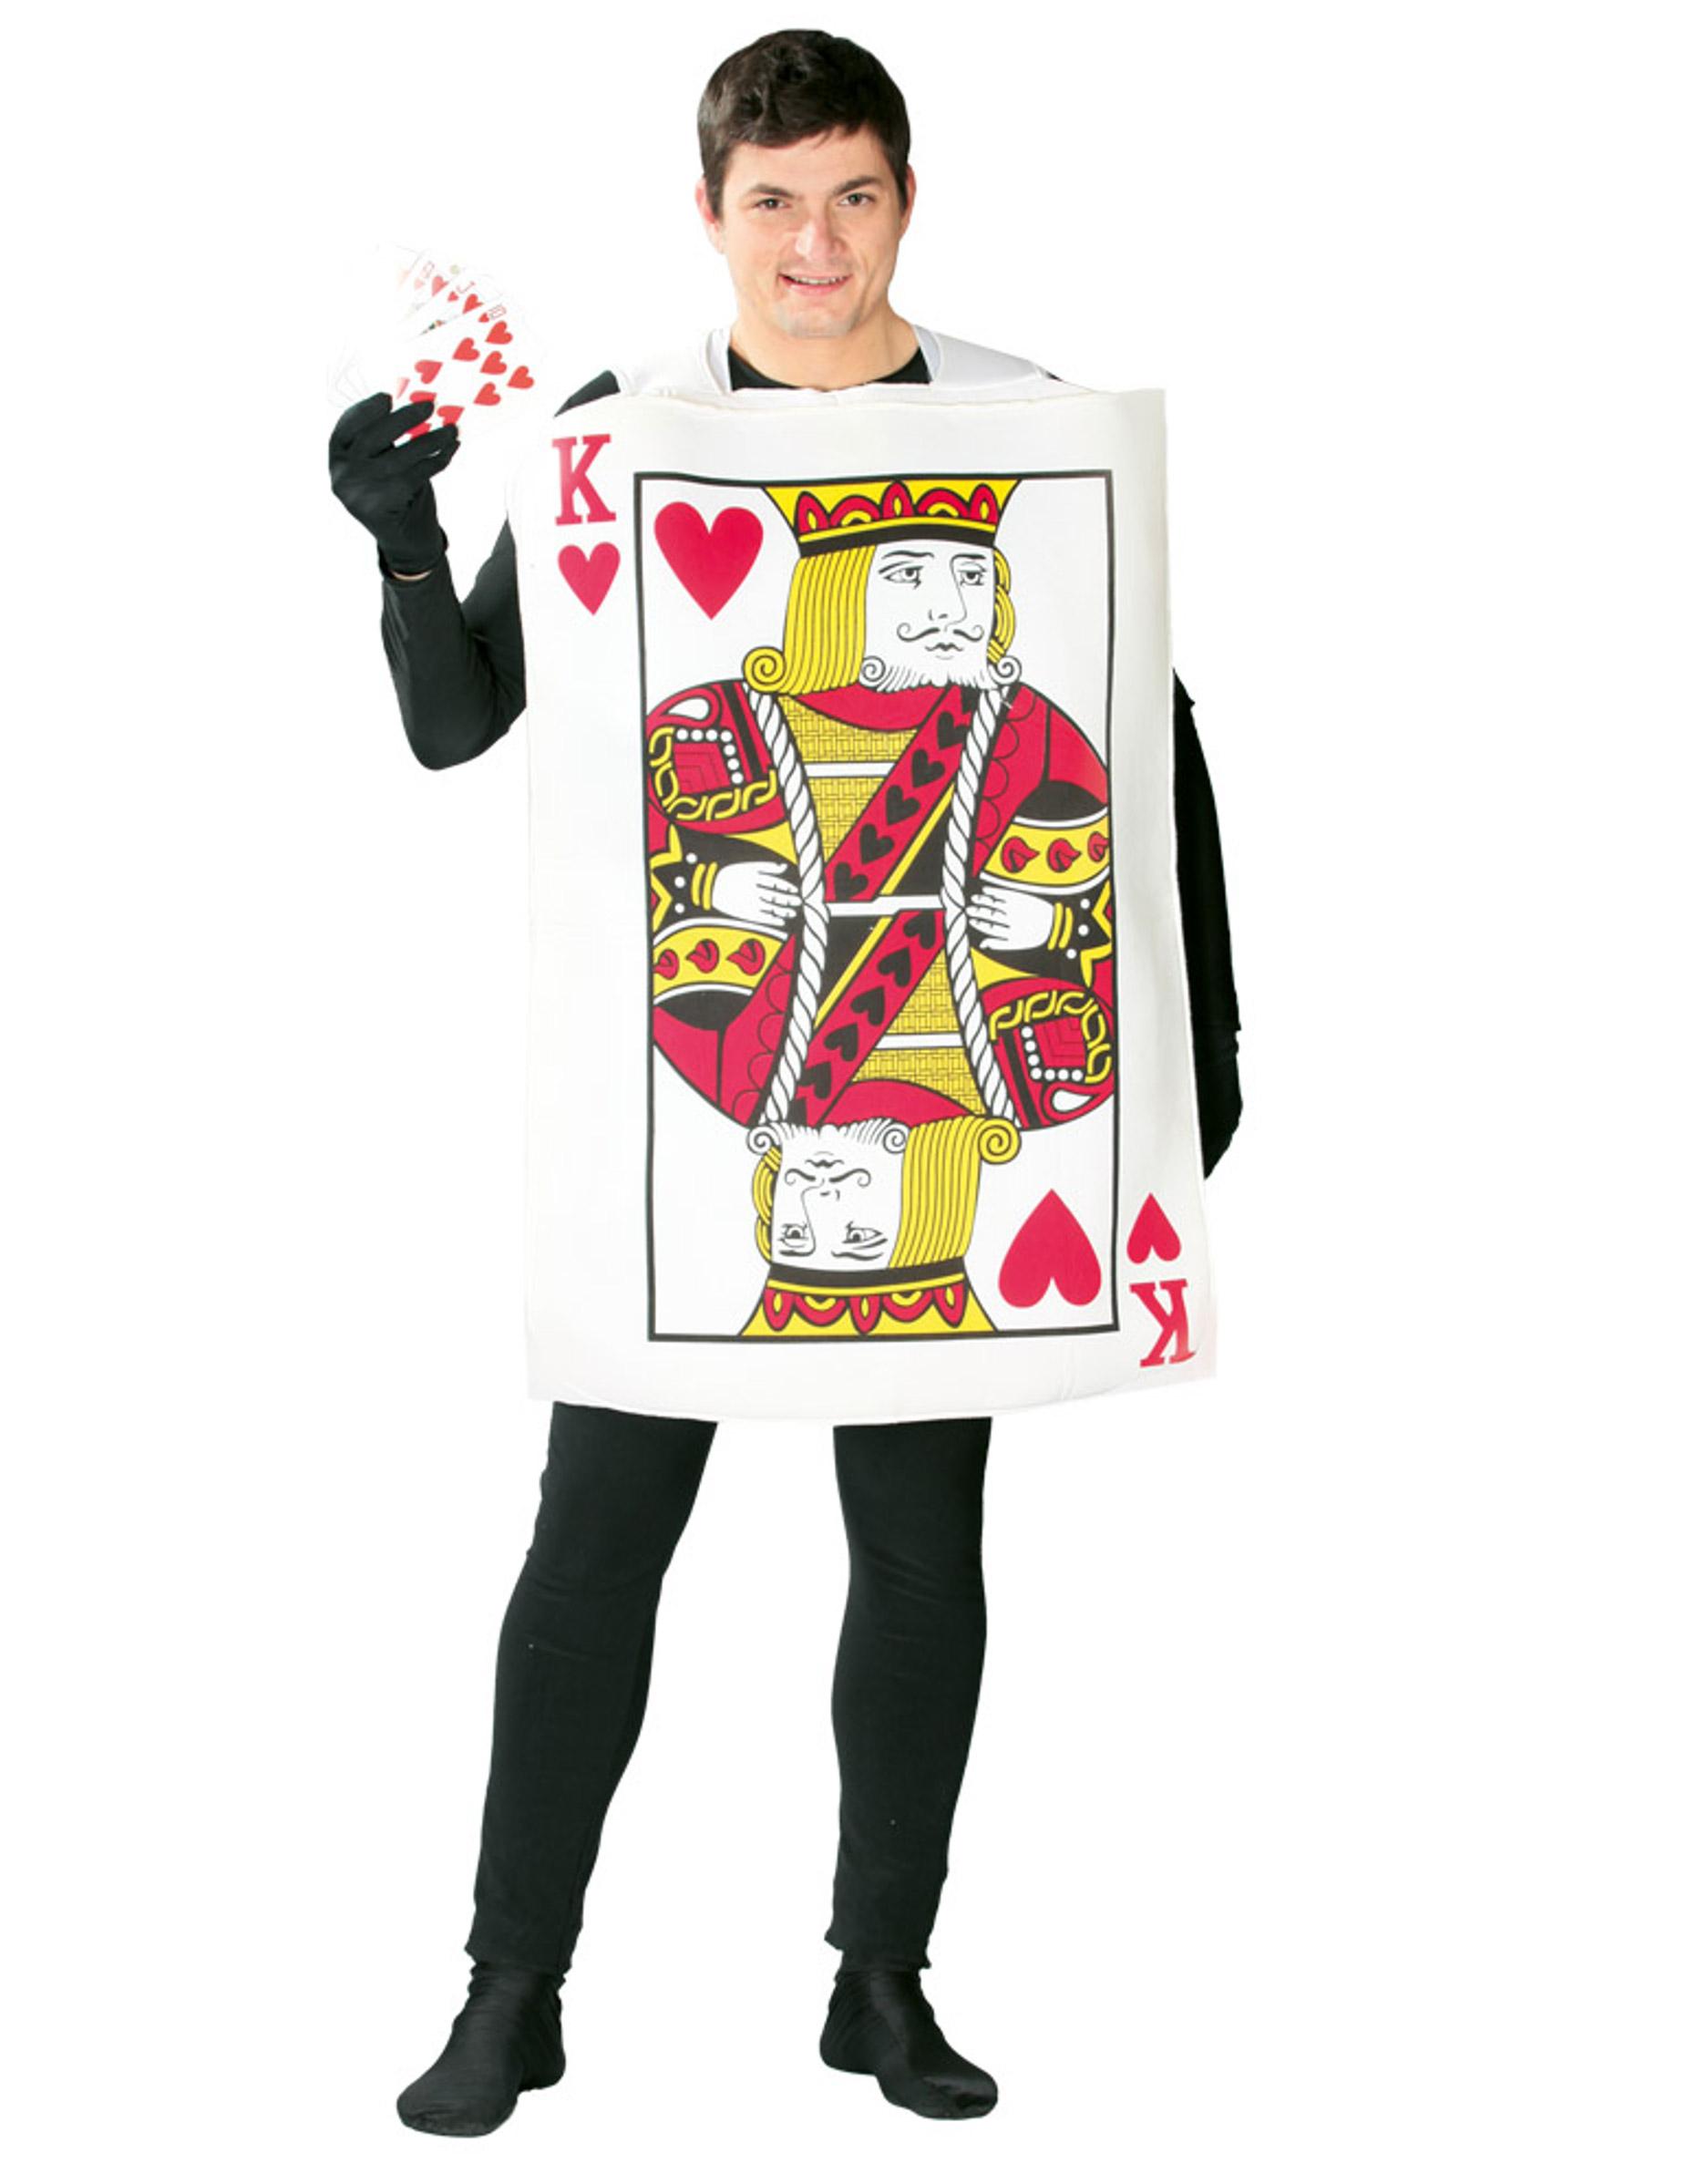 herz-konig-karte-kostum-fur-herren.jpg